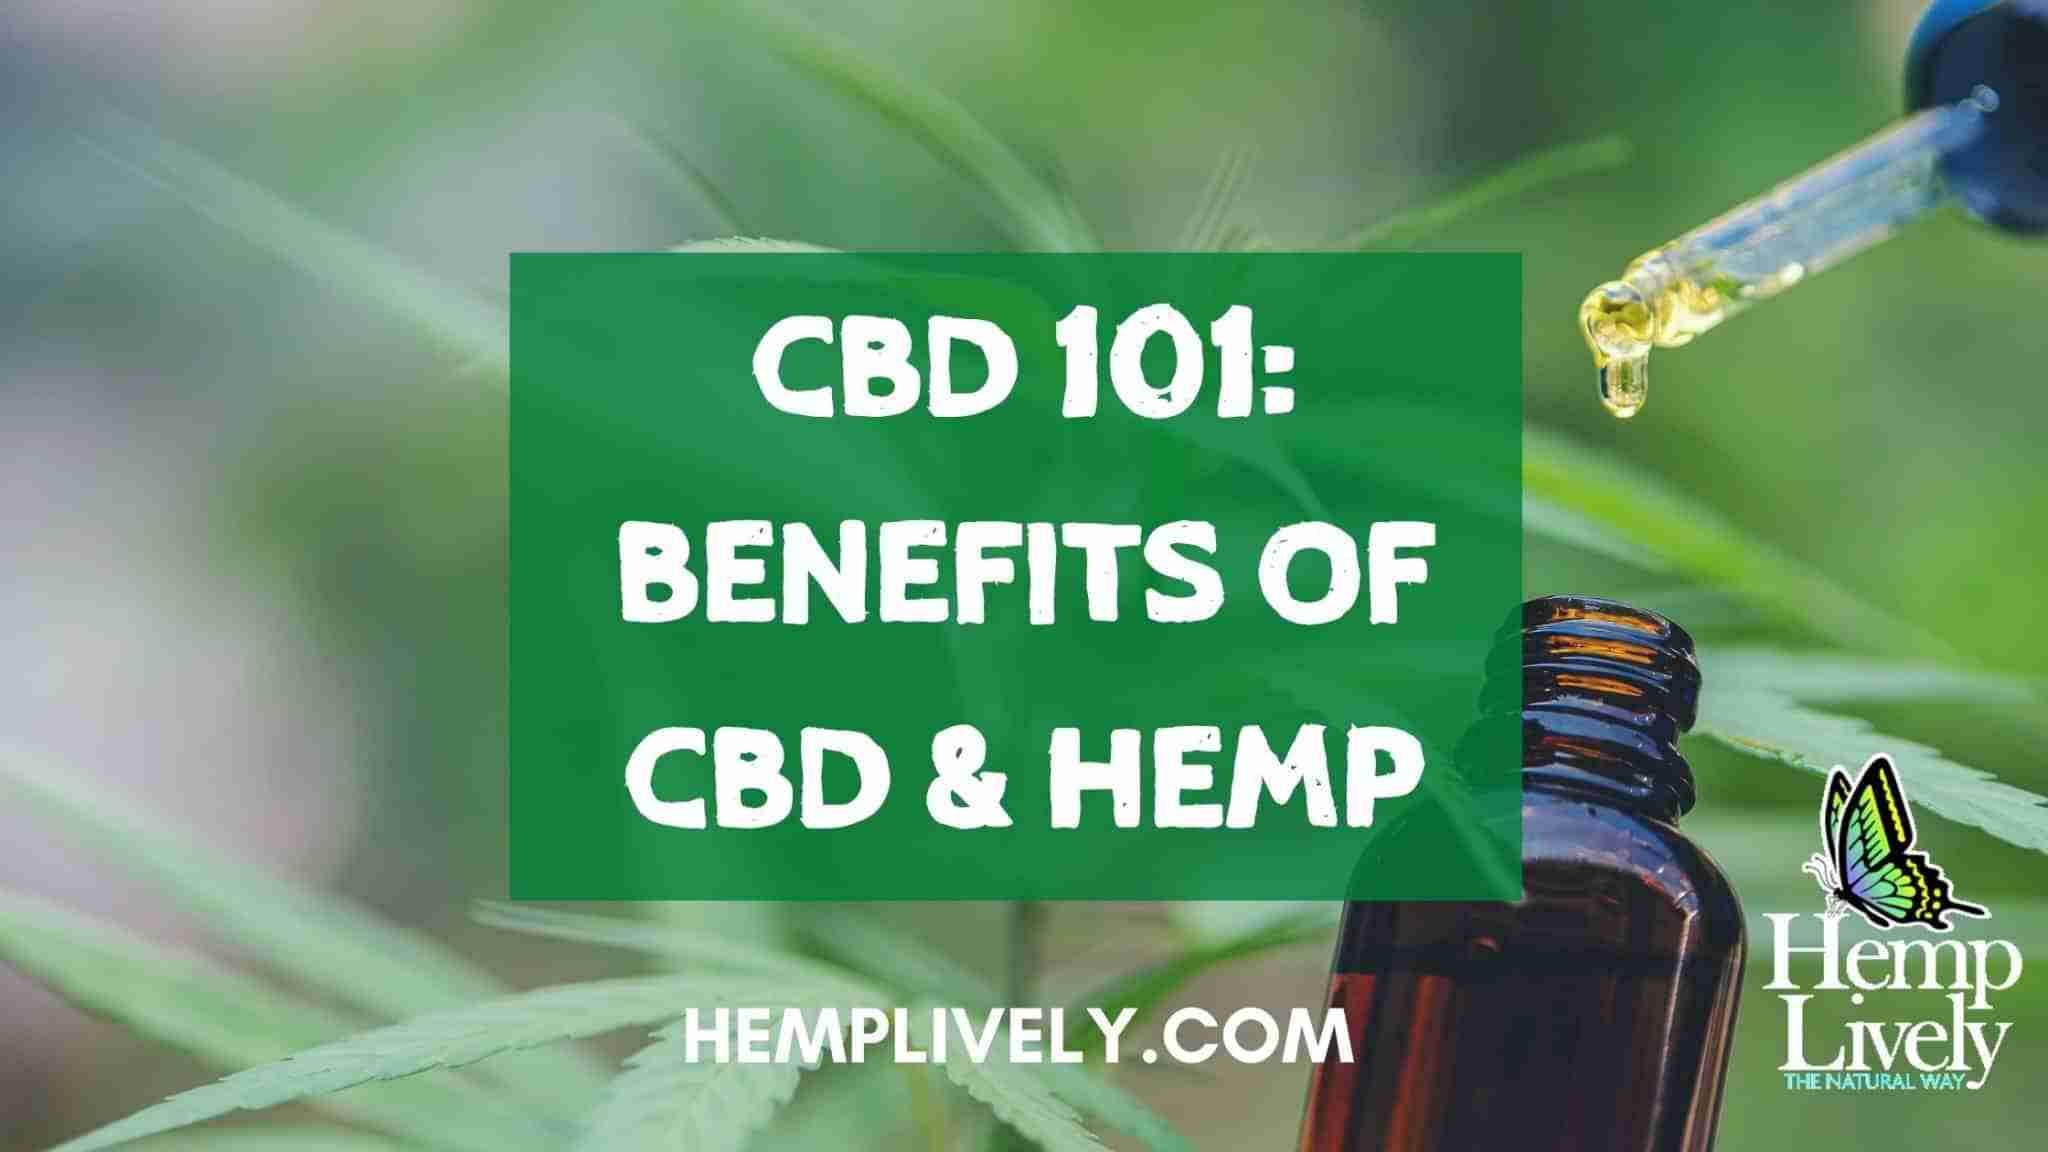 CBD 101: Benefits of CBD and Hemp